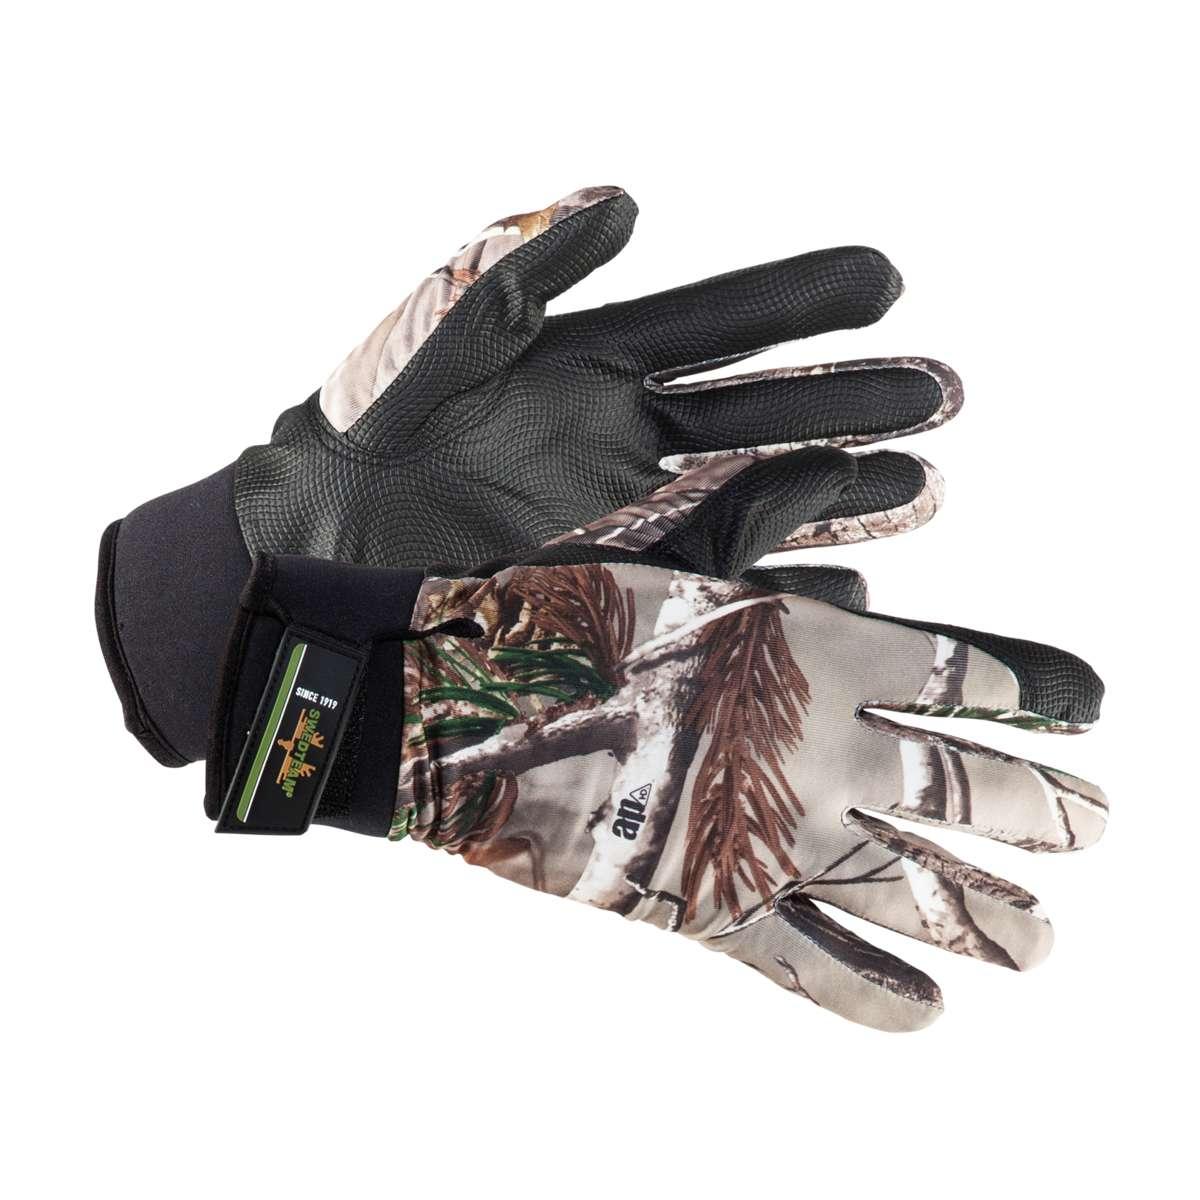 Swedteam Glove Grip Camo käsine, koko 2XL